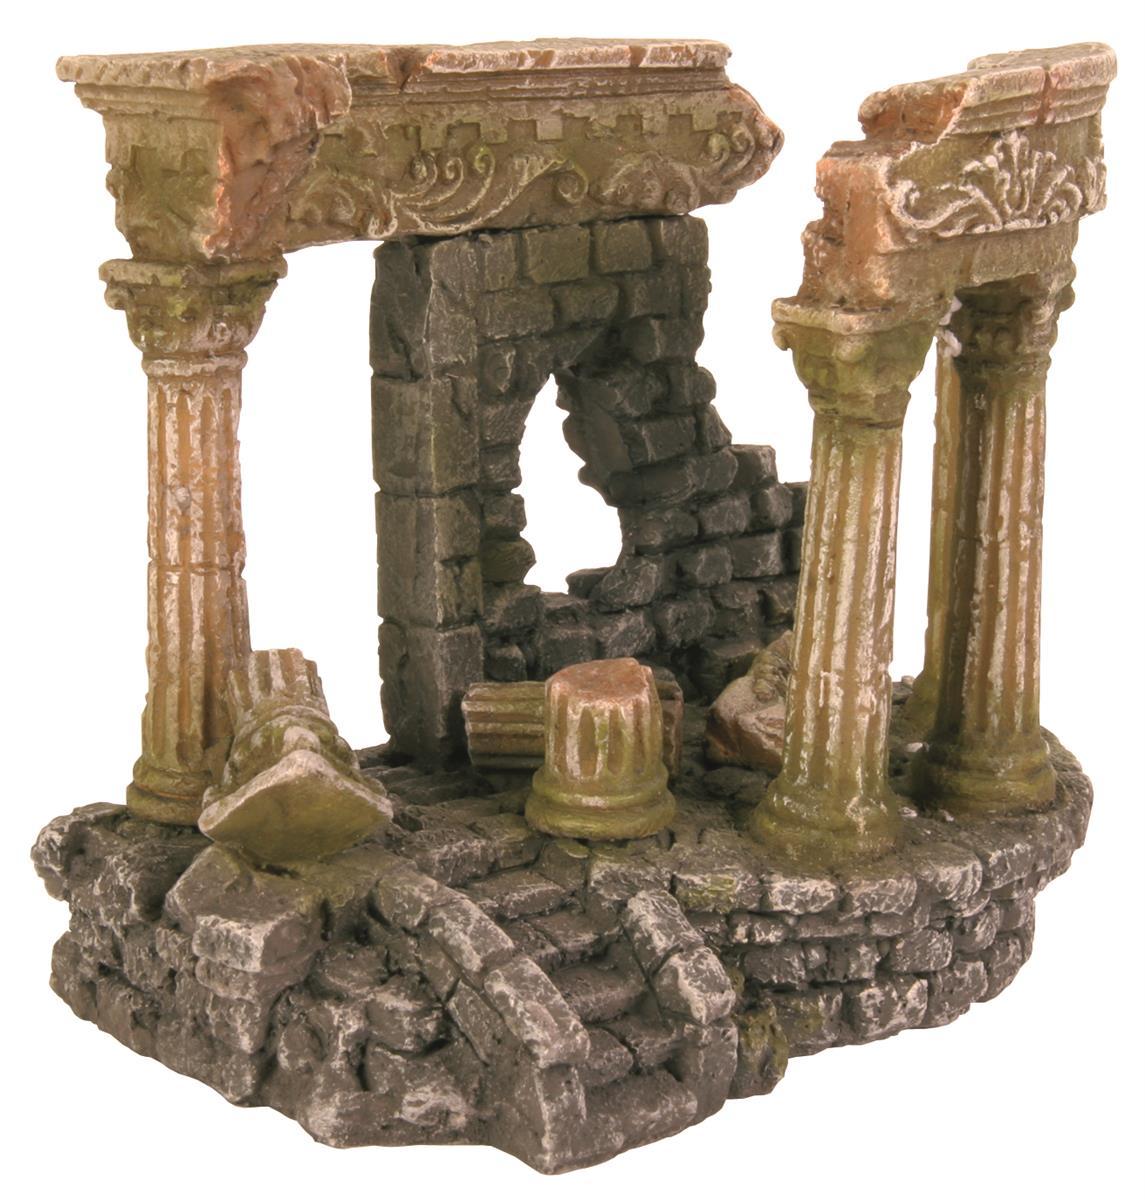 Akvariedekor Romersk ruin 27cm